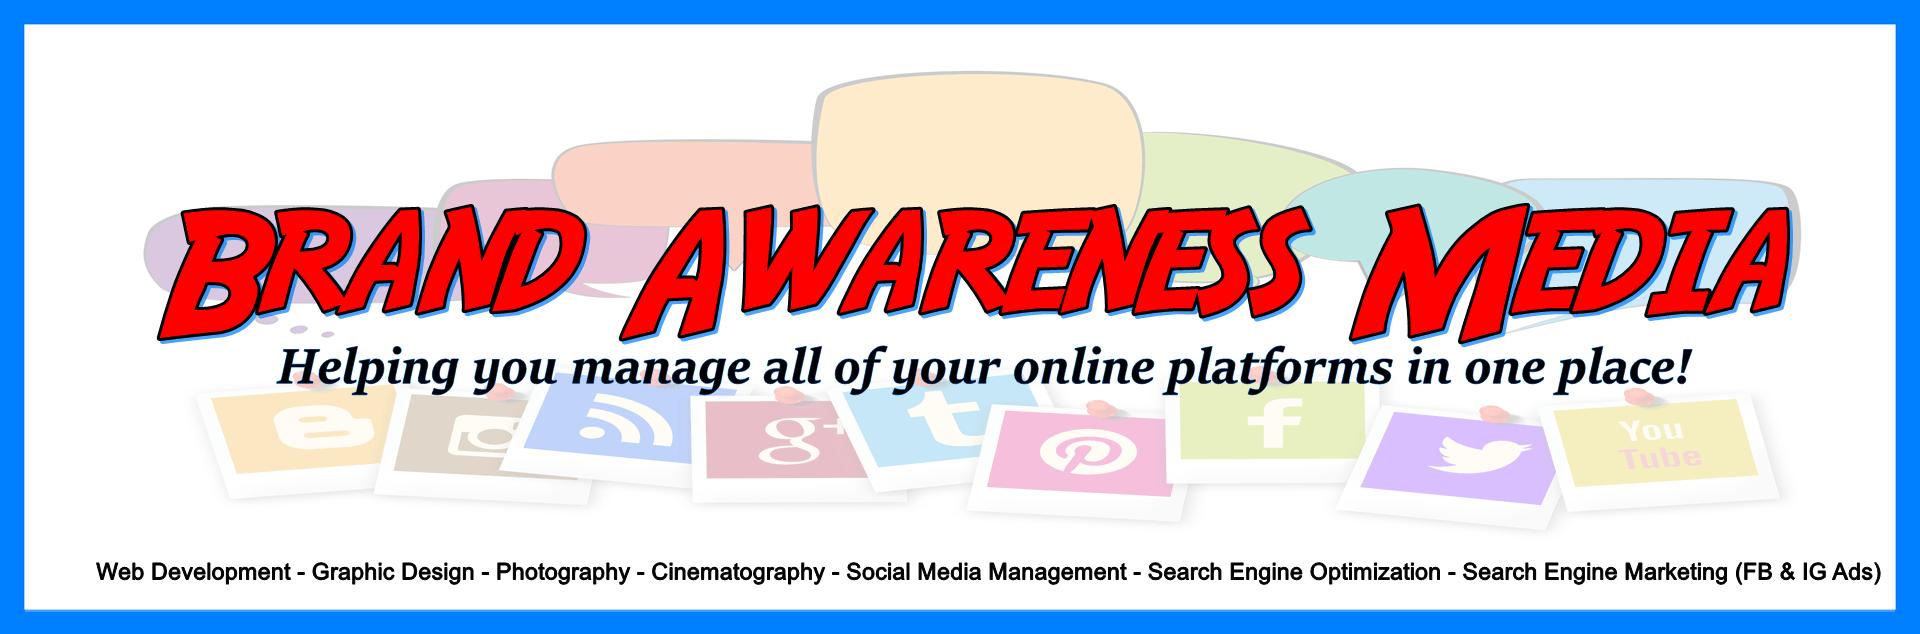 Brand Awareness Media